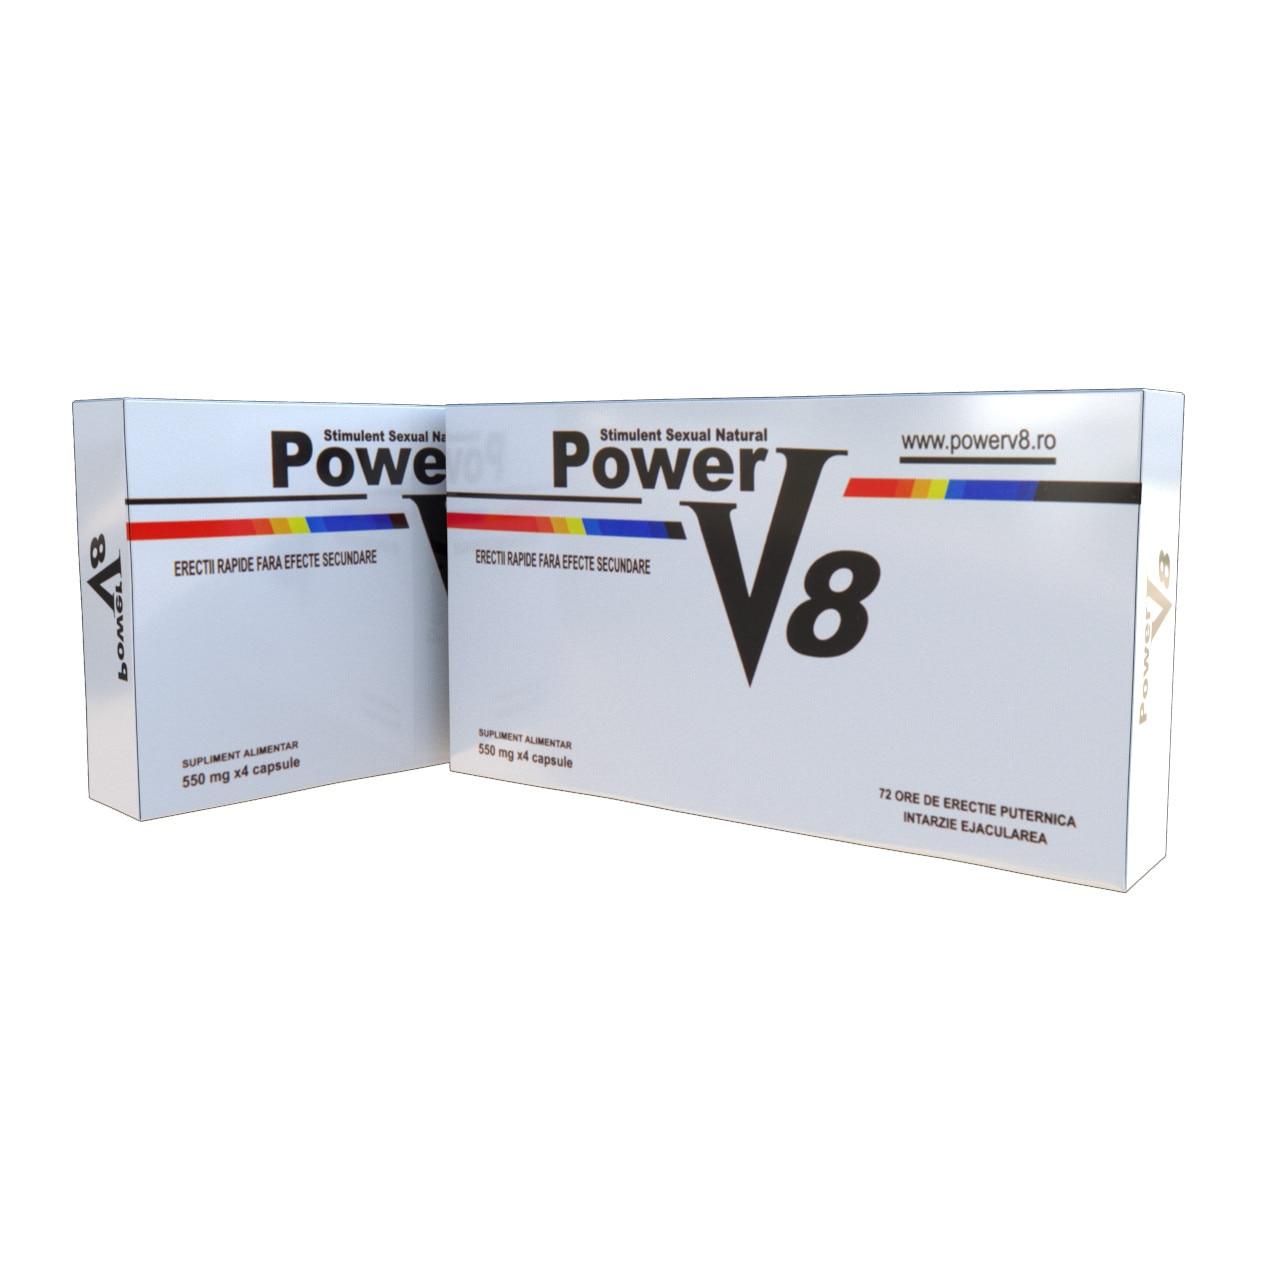 Erecta pret pastile pentru erectie de vanzare, farmacie prospect - univegaconstruct.ro